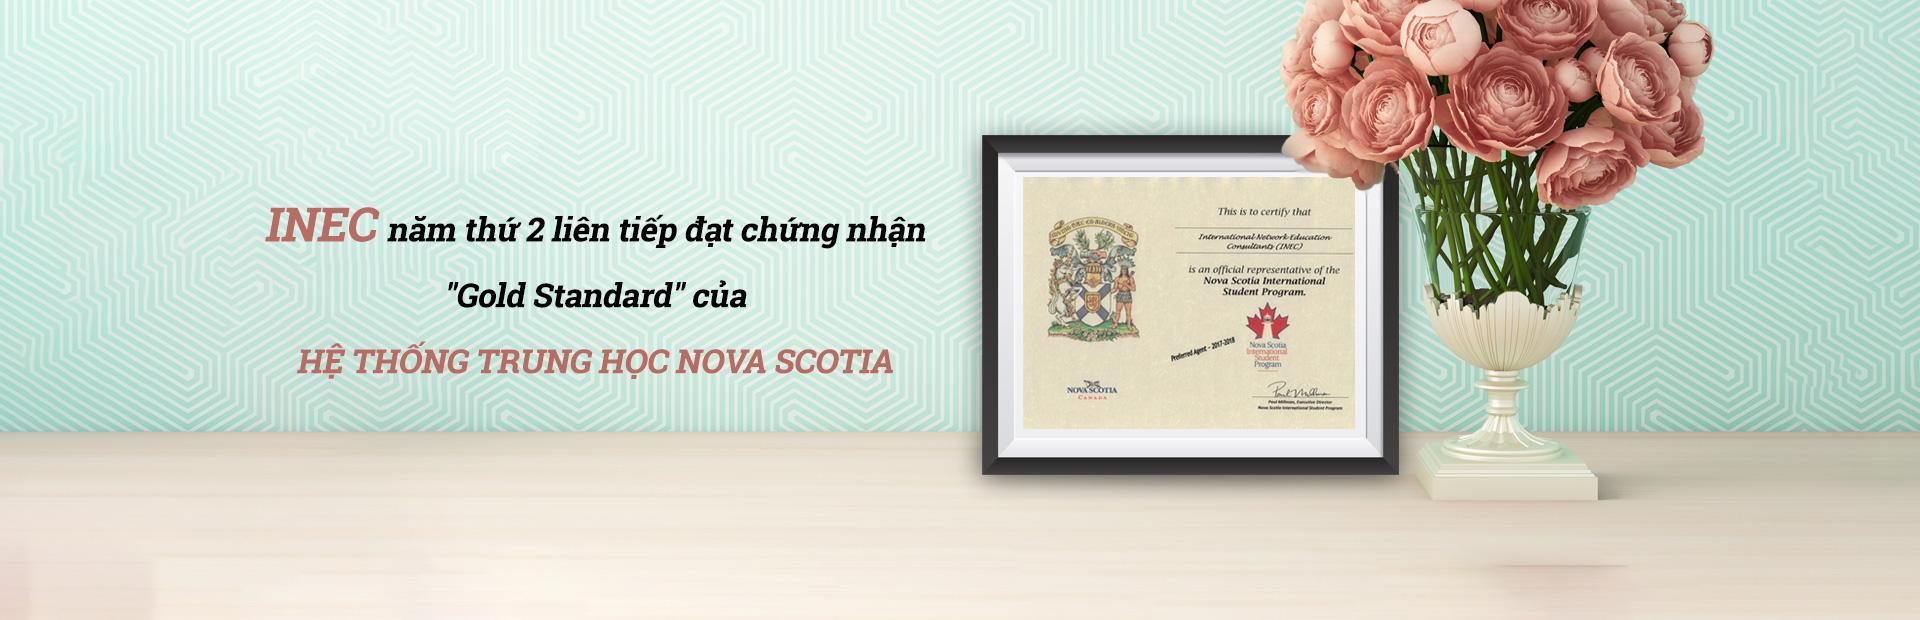 INEC dai dien tuyen sinh xuat sac Nova Scotia